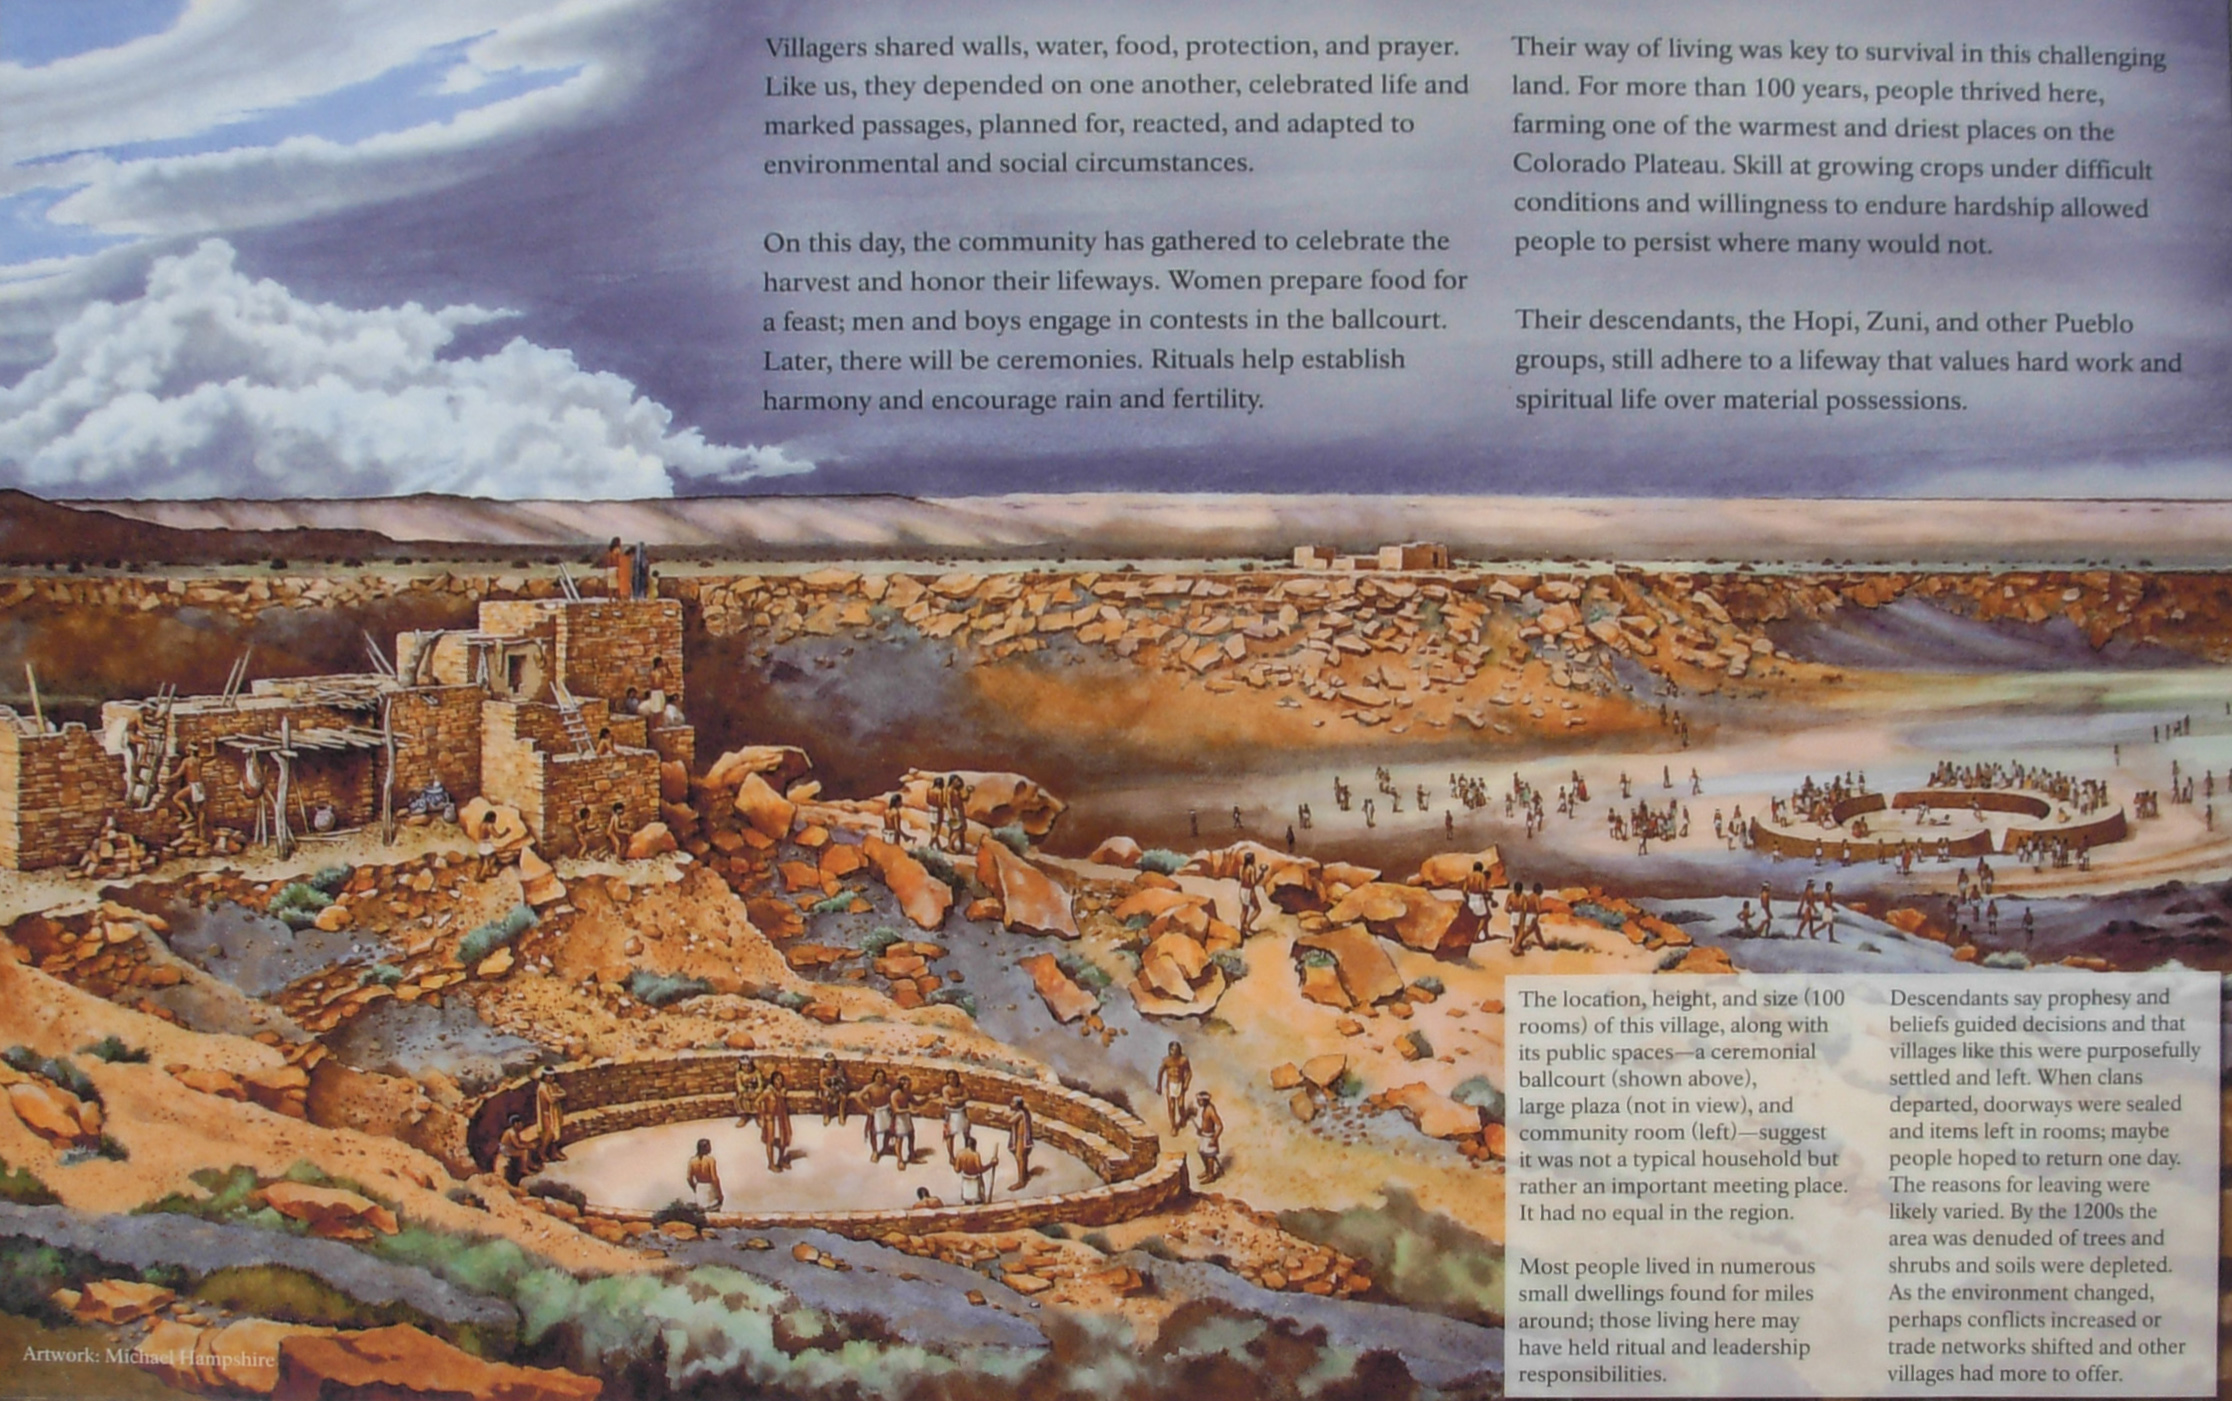 Interpretative panel on the overlook for Wupatki Pueblo